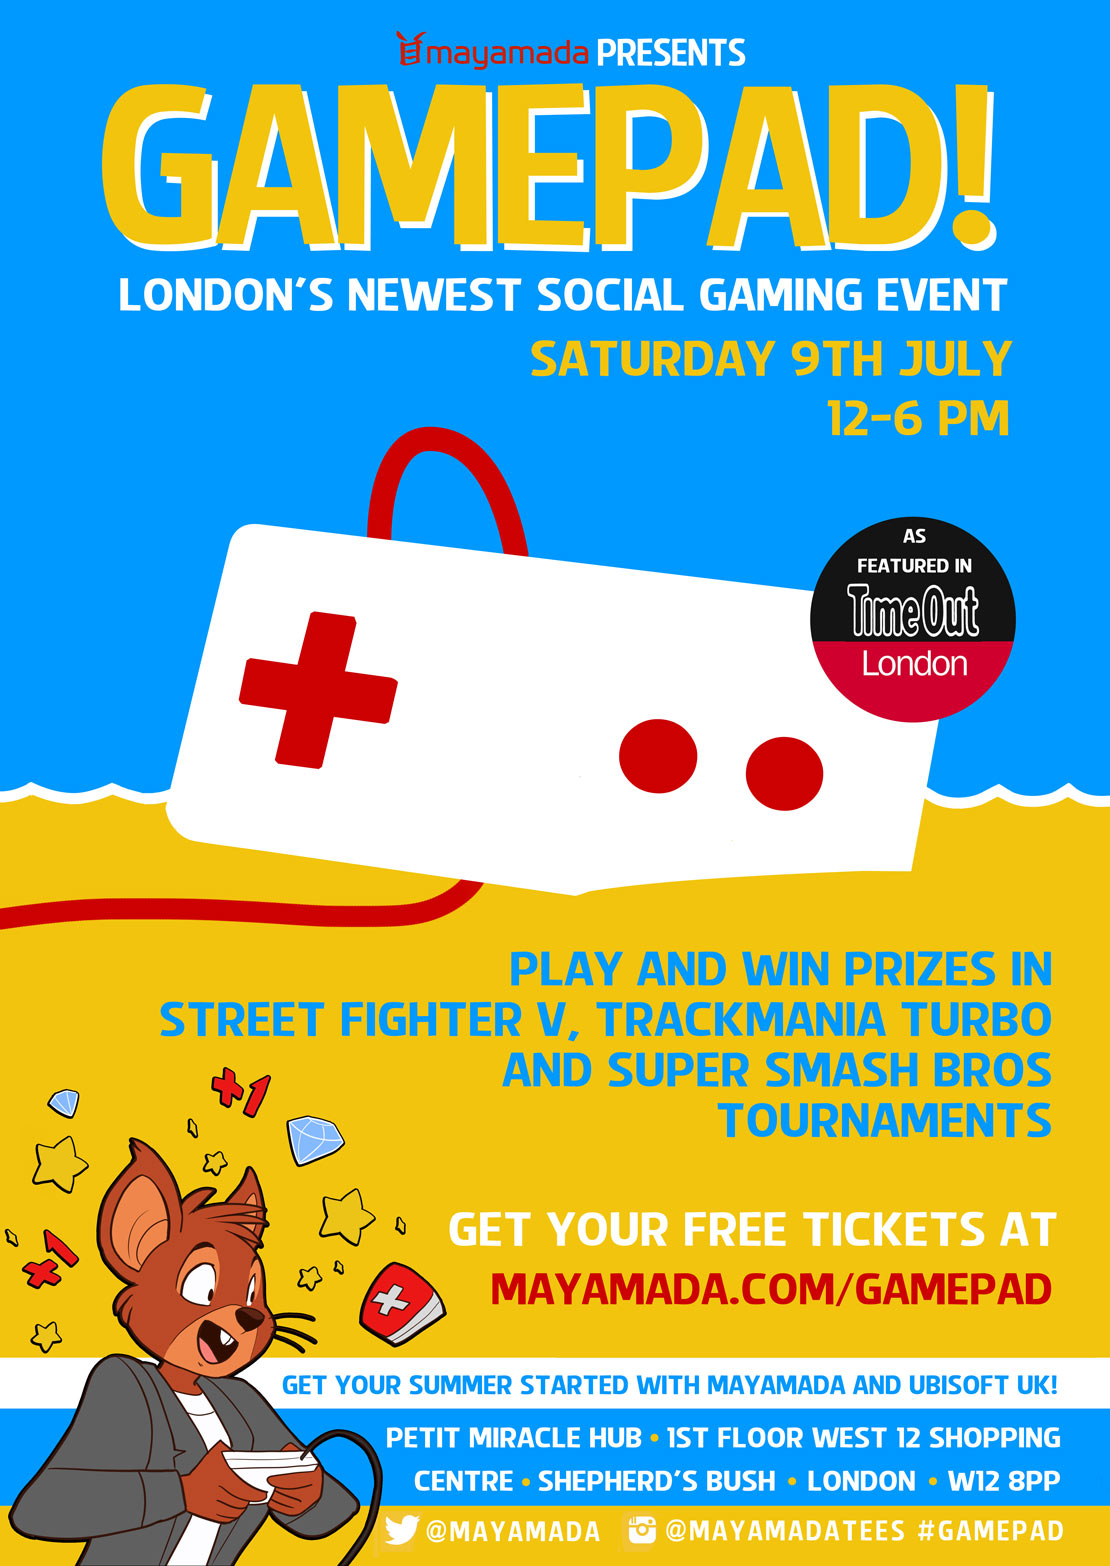 GamePad Summer Edition - mayamada